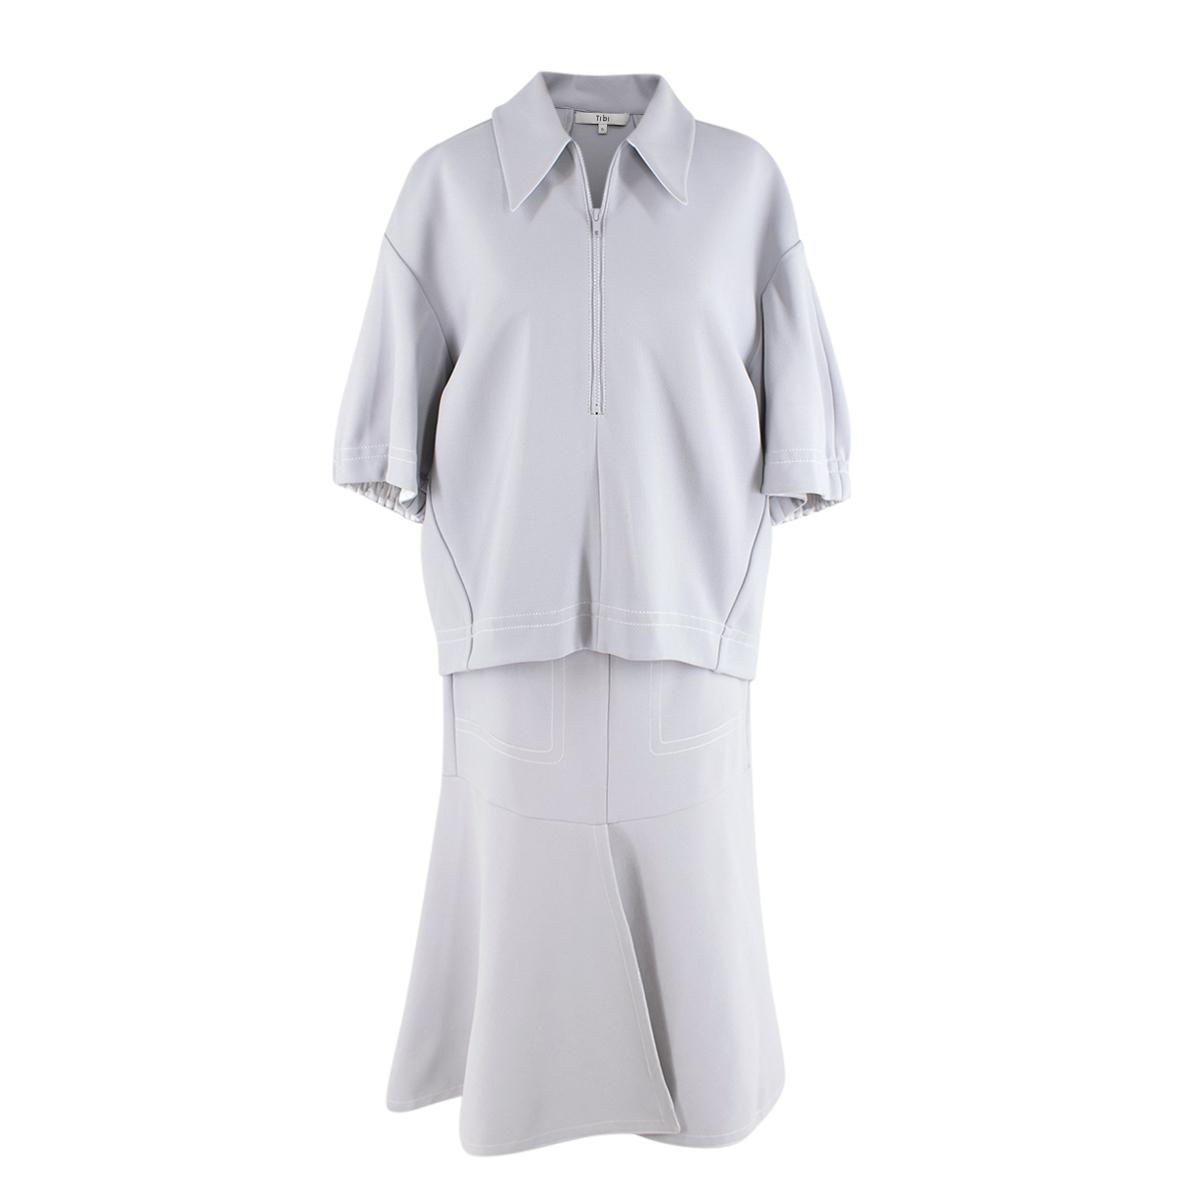 Tibi Light Grey Frisse Ponte Oversize Polo Shirt and Midi Skirt Set